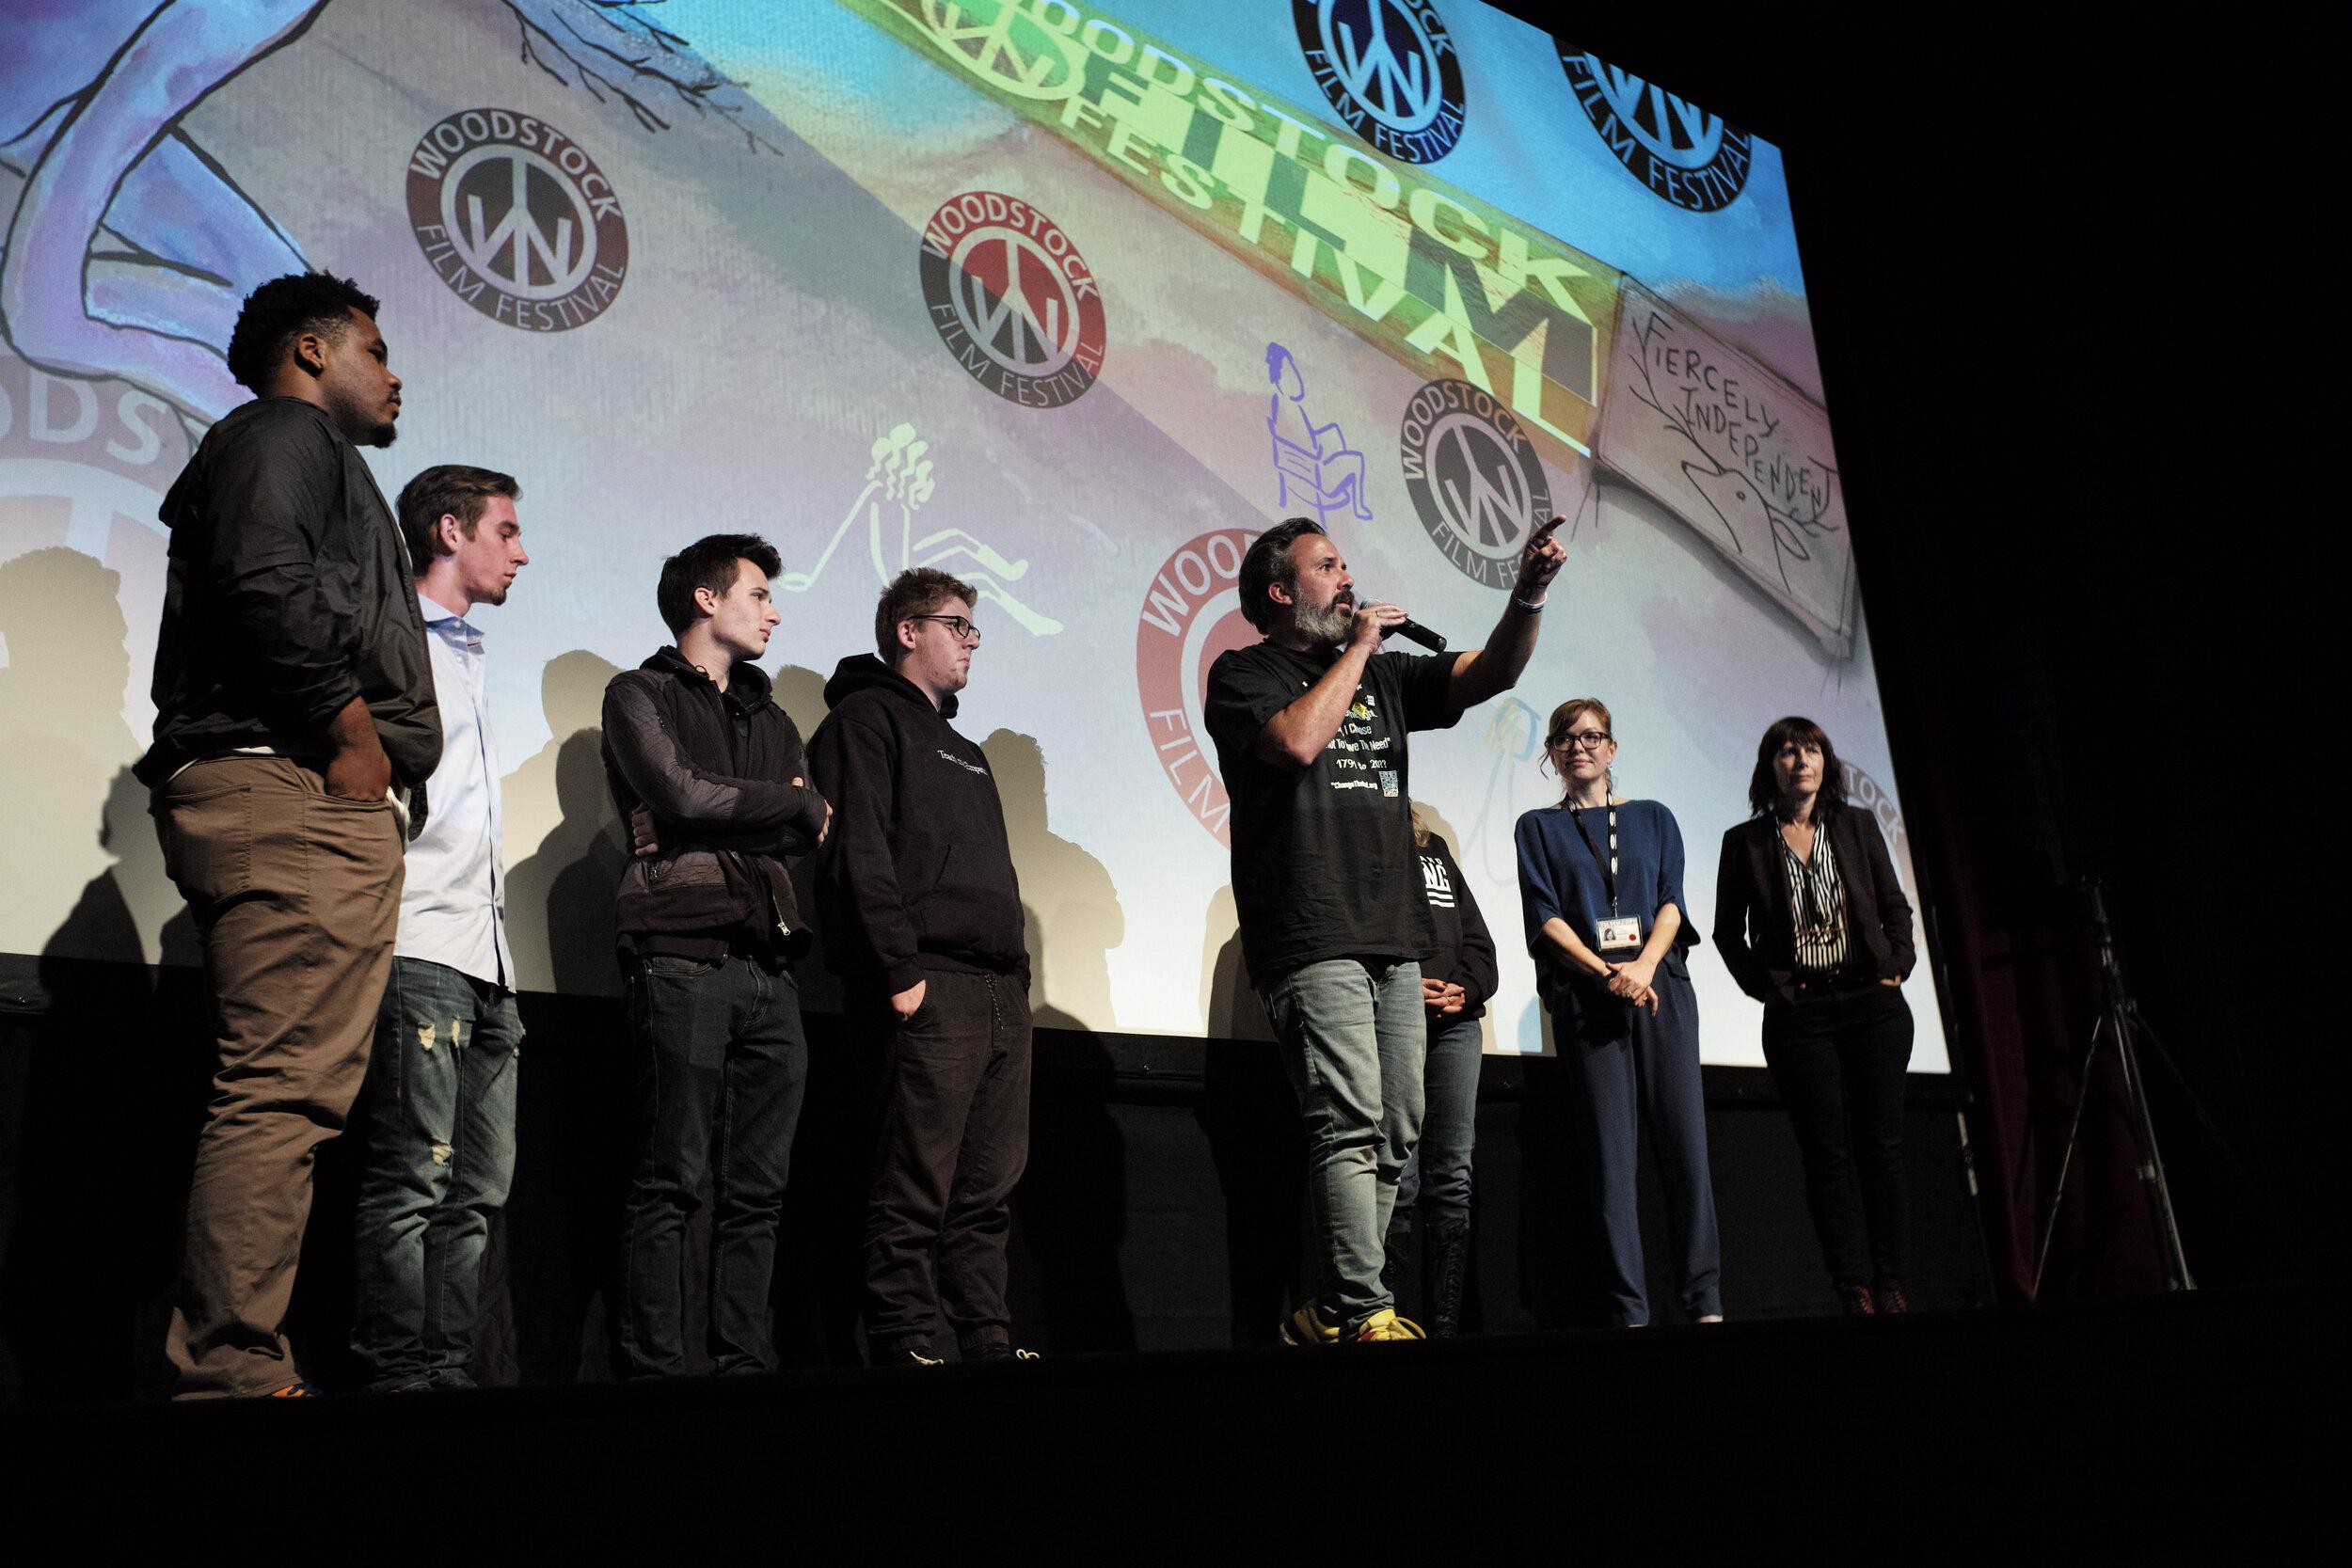 (From left) Jammal Lemmy, Sam Zeif, Cameron Kasky, Matt Deitsch, Manuel Oliver, Patricia Oliver, and Cheryl Horner speak following the world premiere of  Parkland Rising.